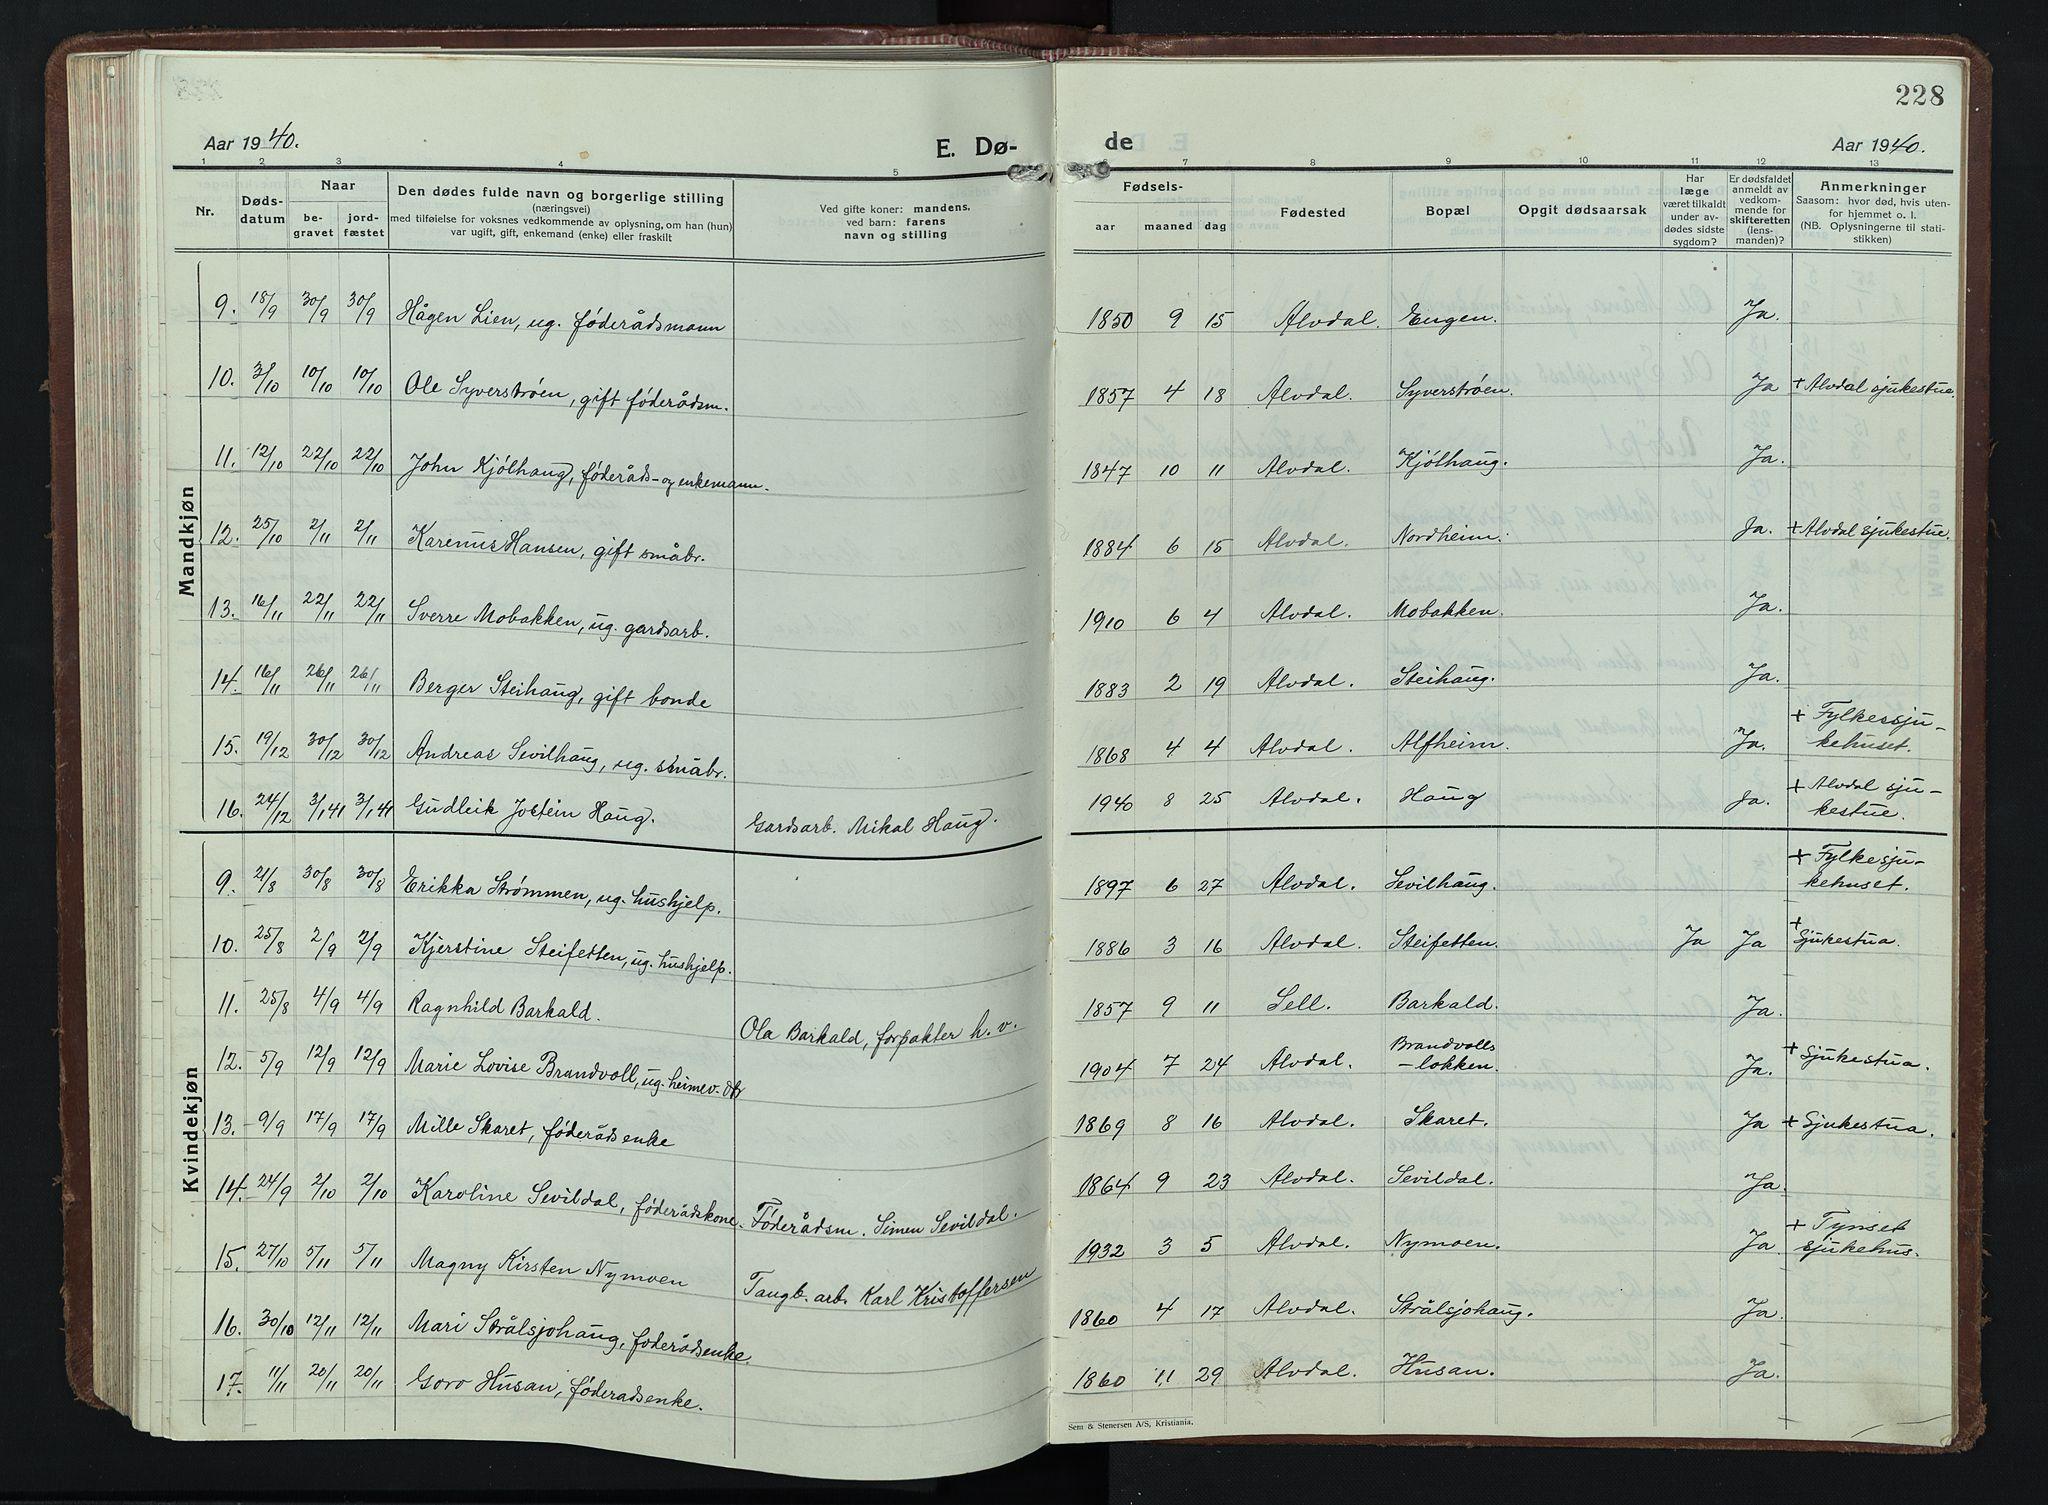 SAH, Alvdal prestekontor, Klokkerbok nr. 7, 1924-1945, s. 228